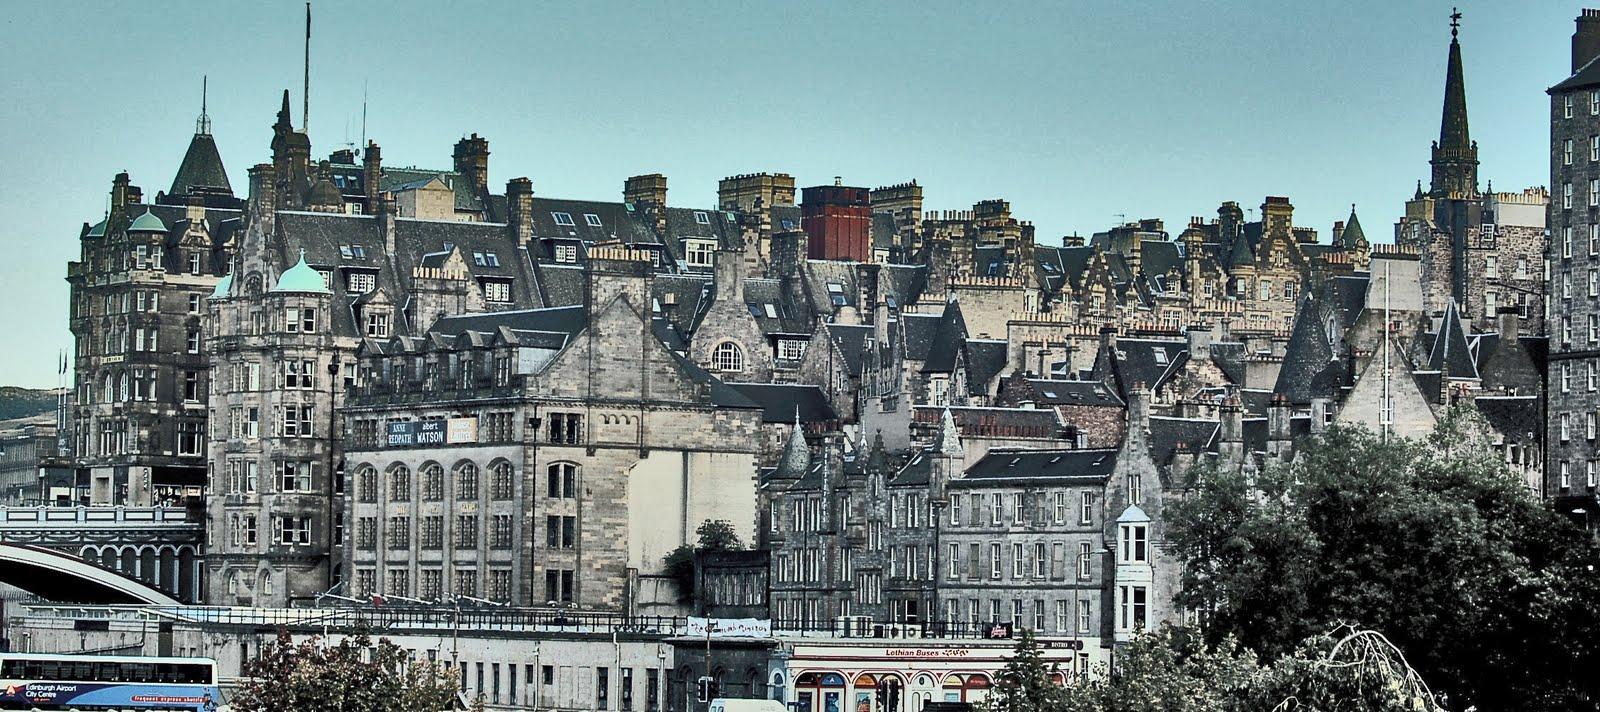 Cursos de Inglés en Edimburgo Superior - Kaplan